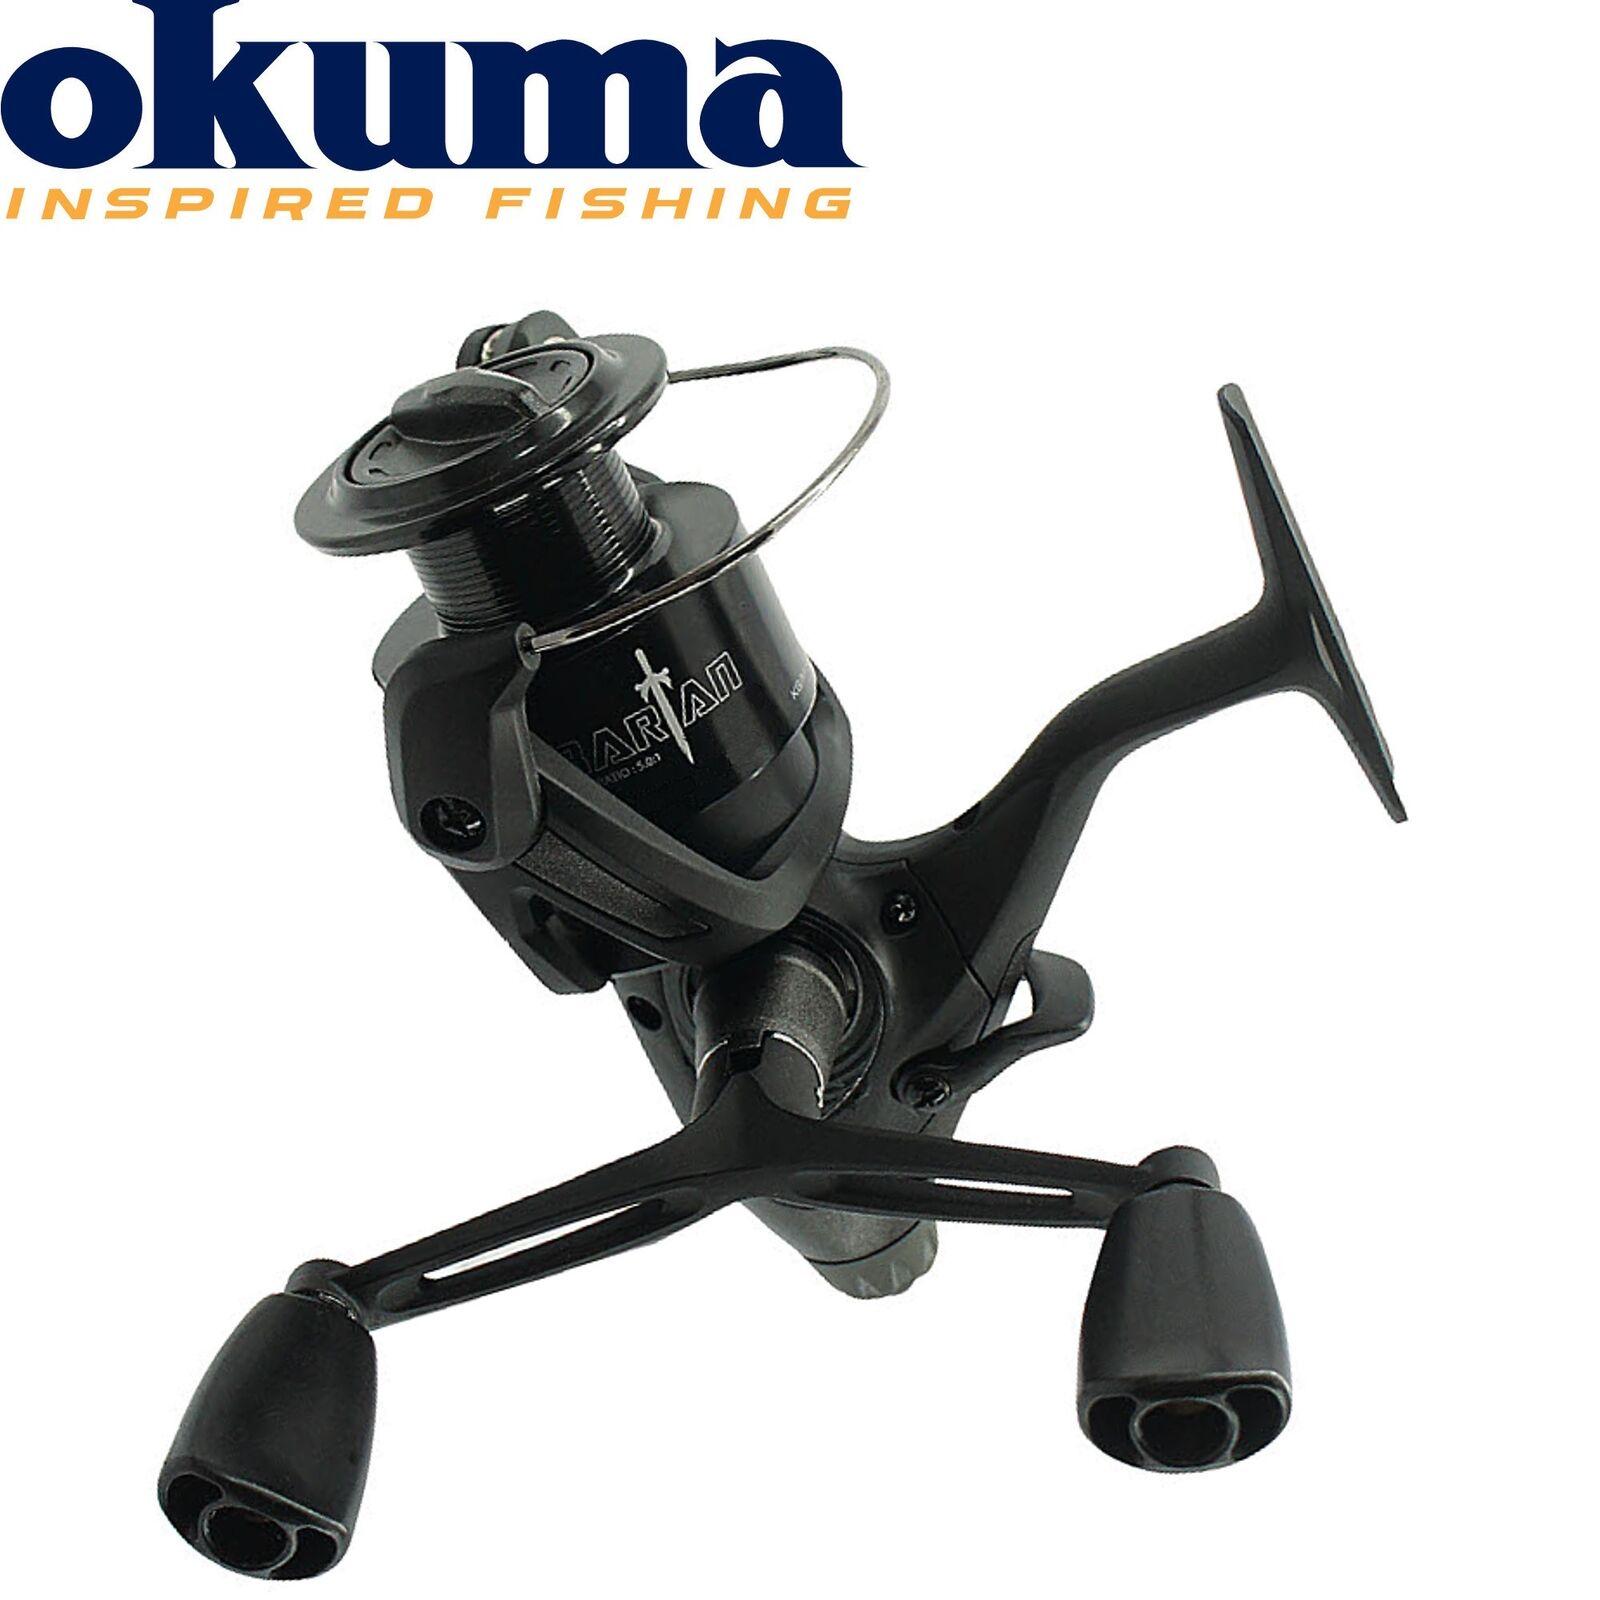 OKUMA babarian BF bn-55 - aperto ruolo, feederrolle, Angel Ruolo per pesci Fried